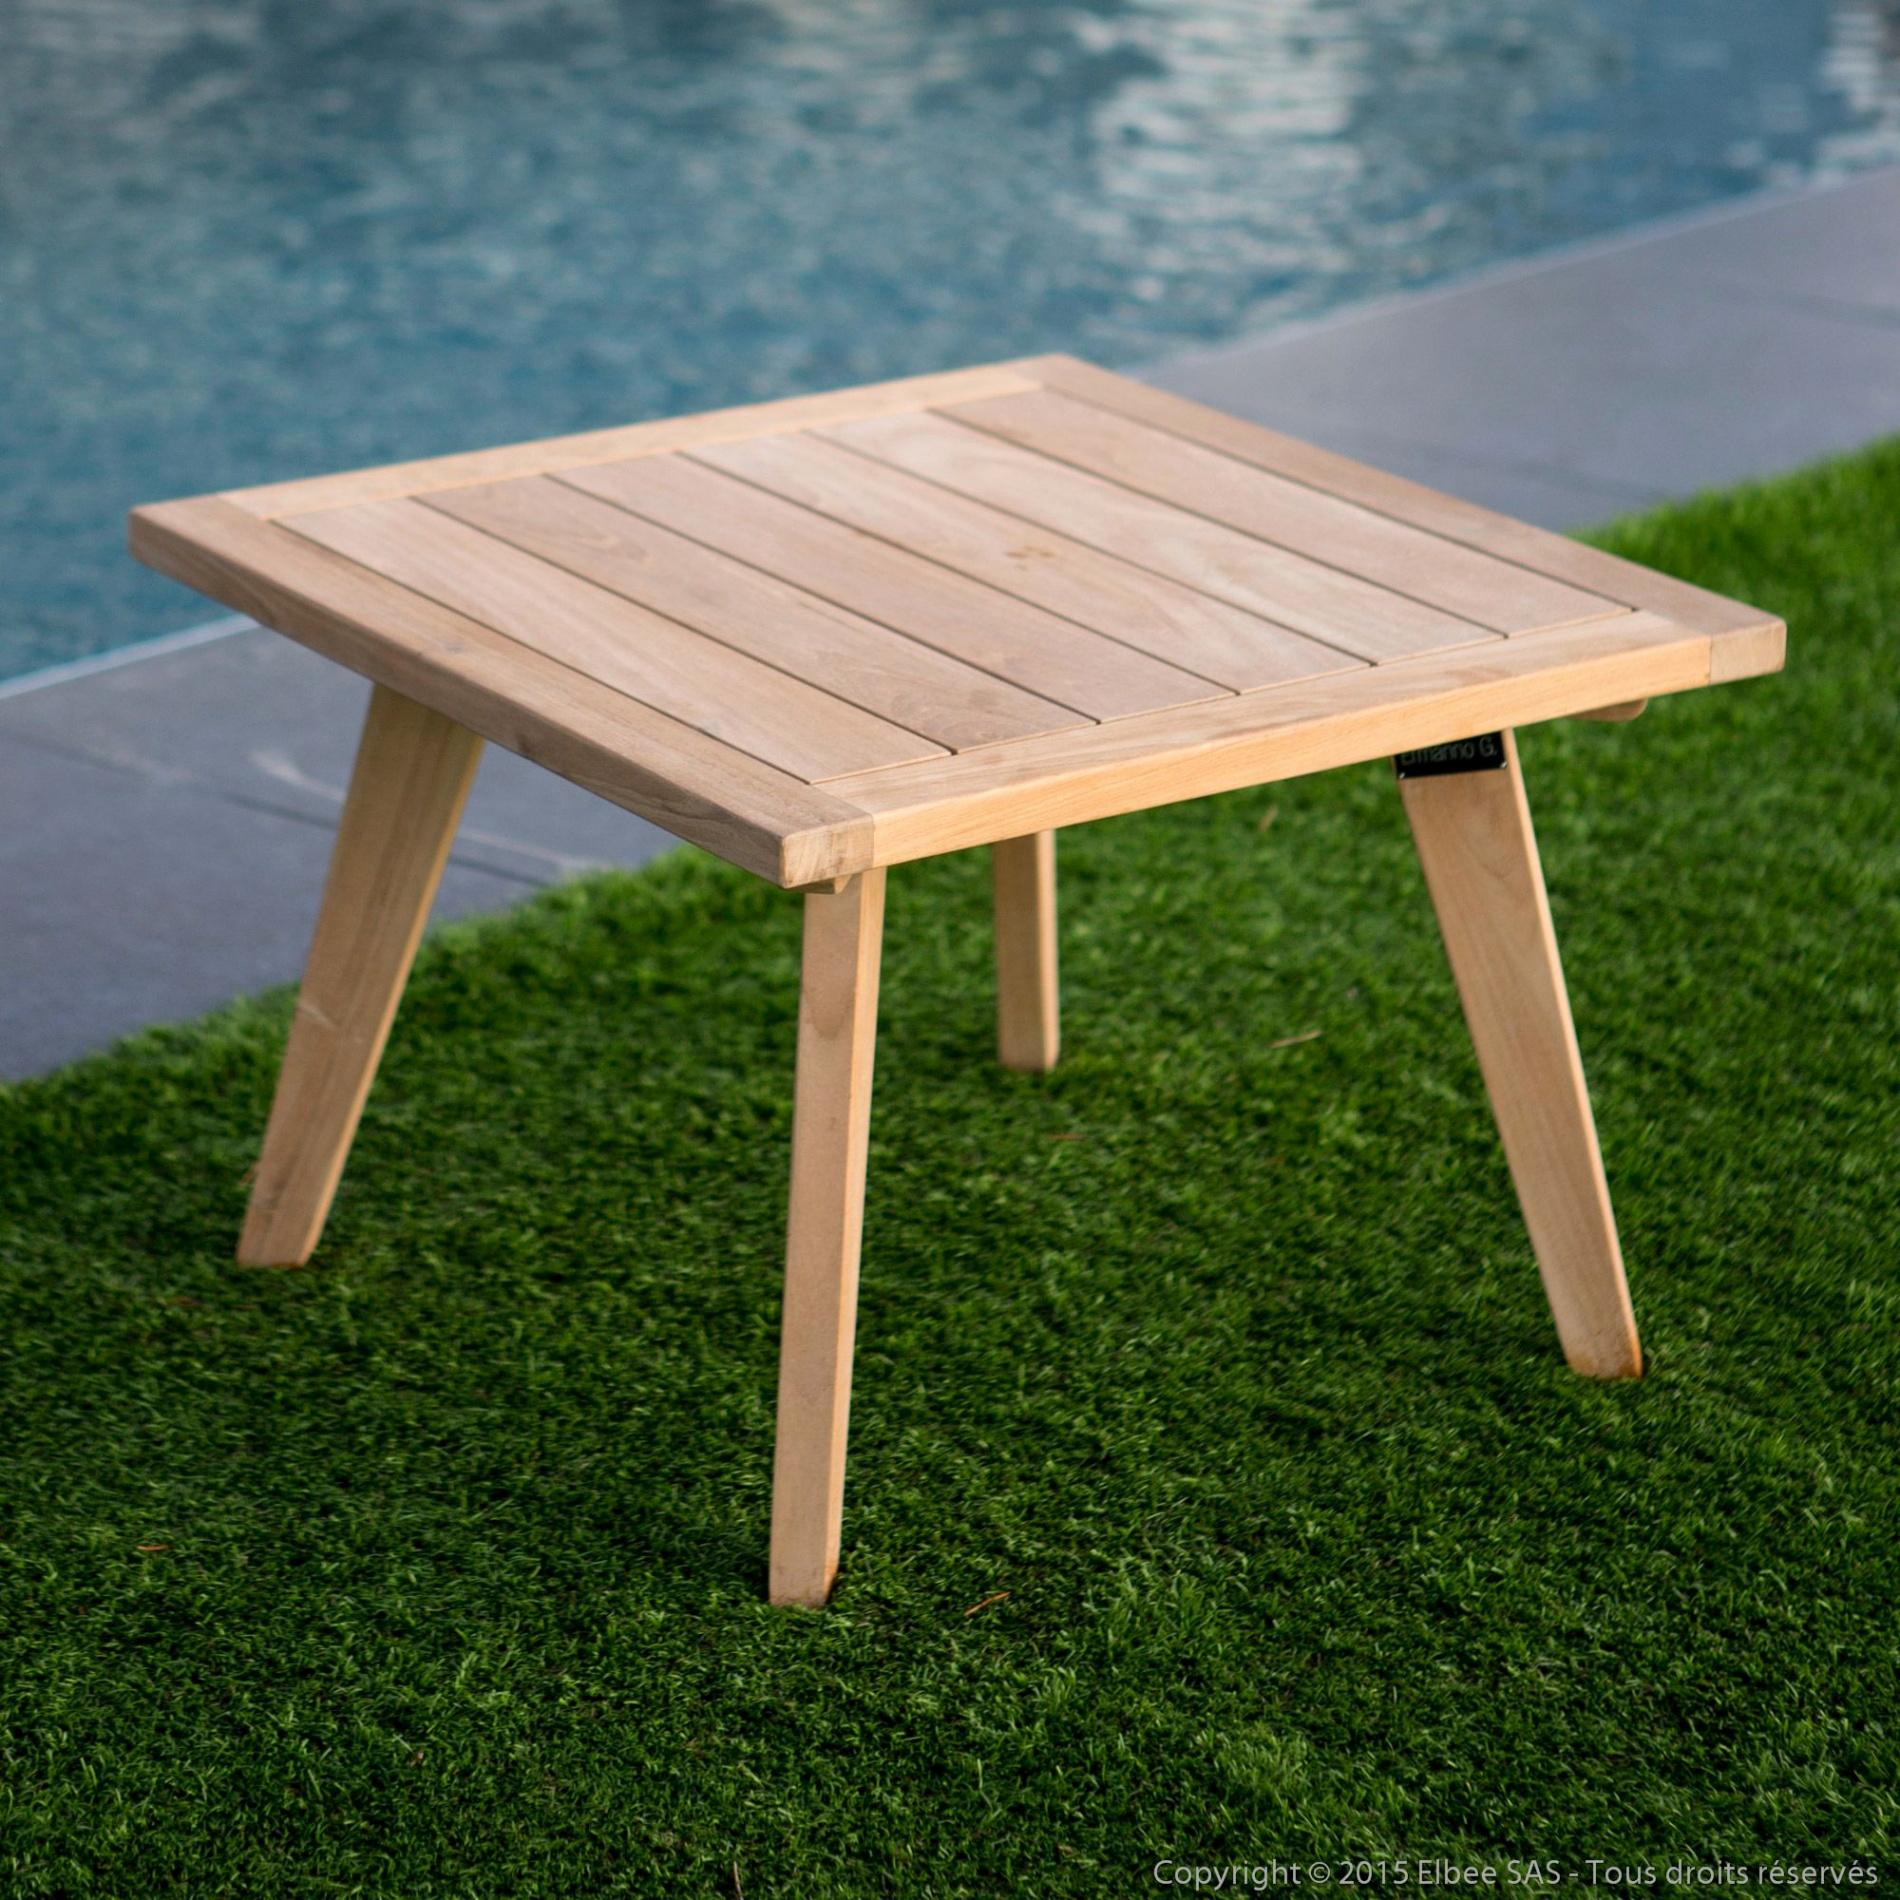 table basse teck luxe table basse de jardin en teck brut 60x60cm ethnika table 300 cm of table basse teck